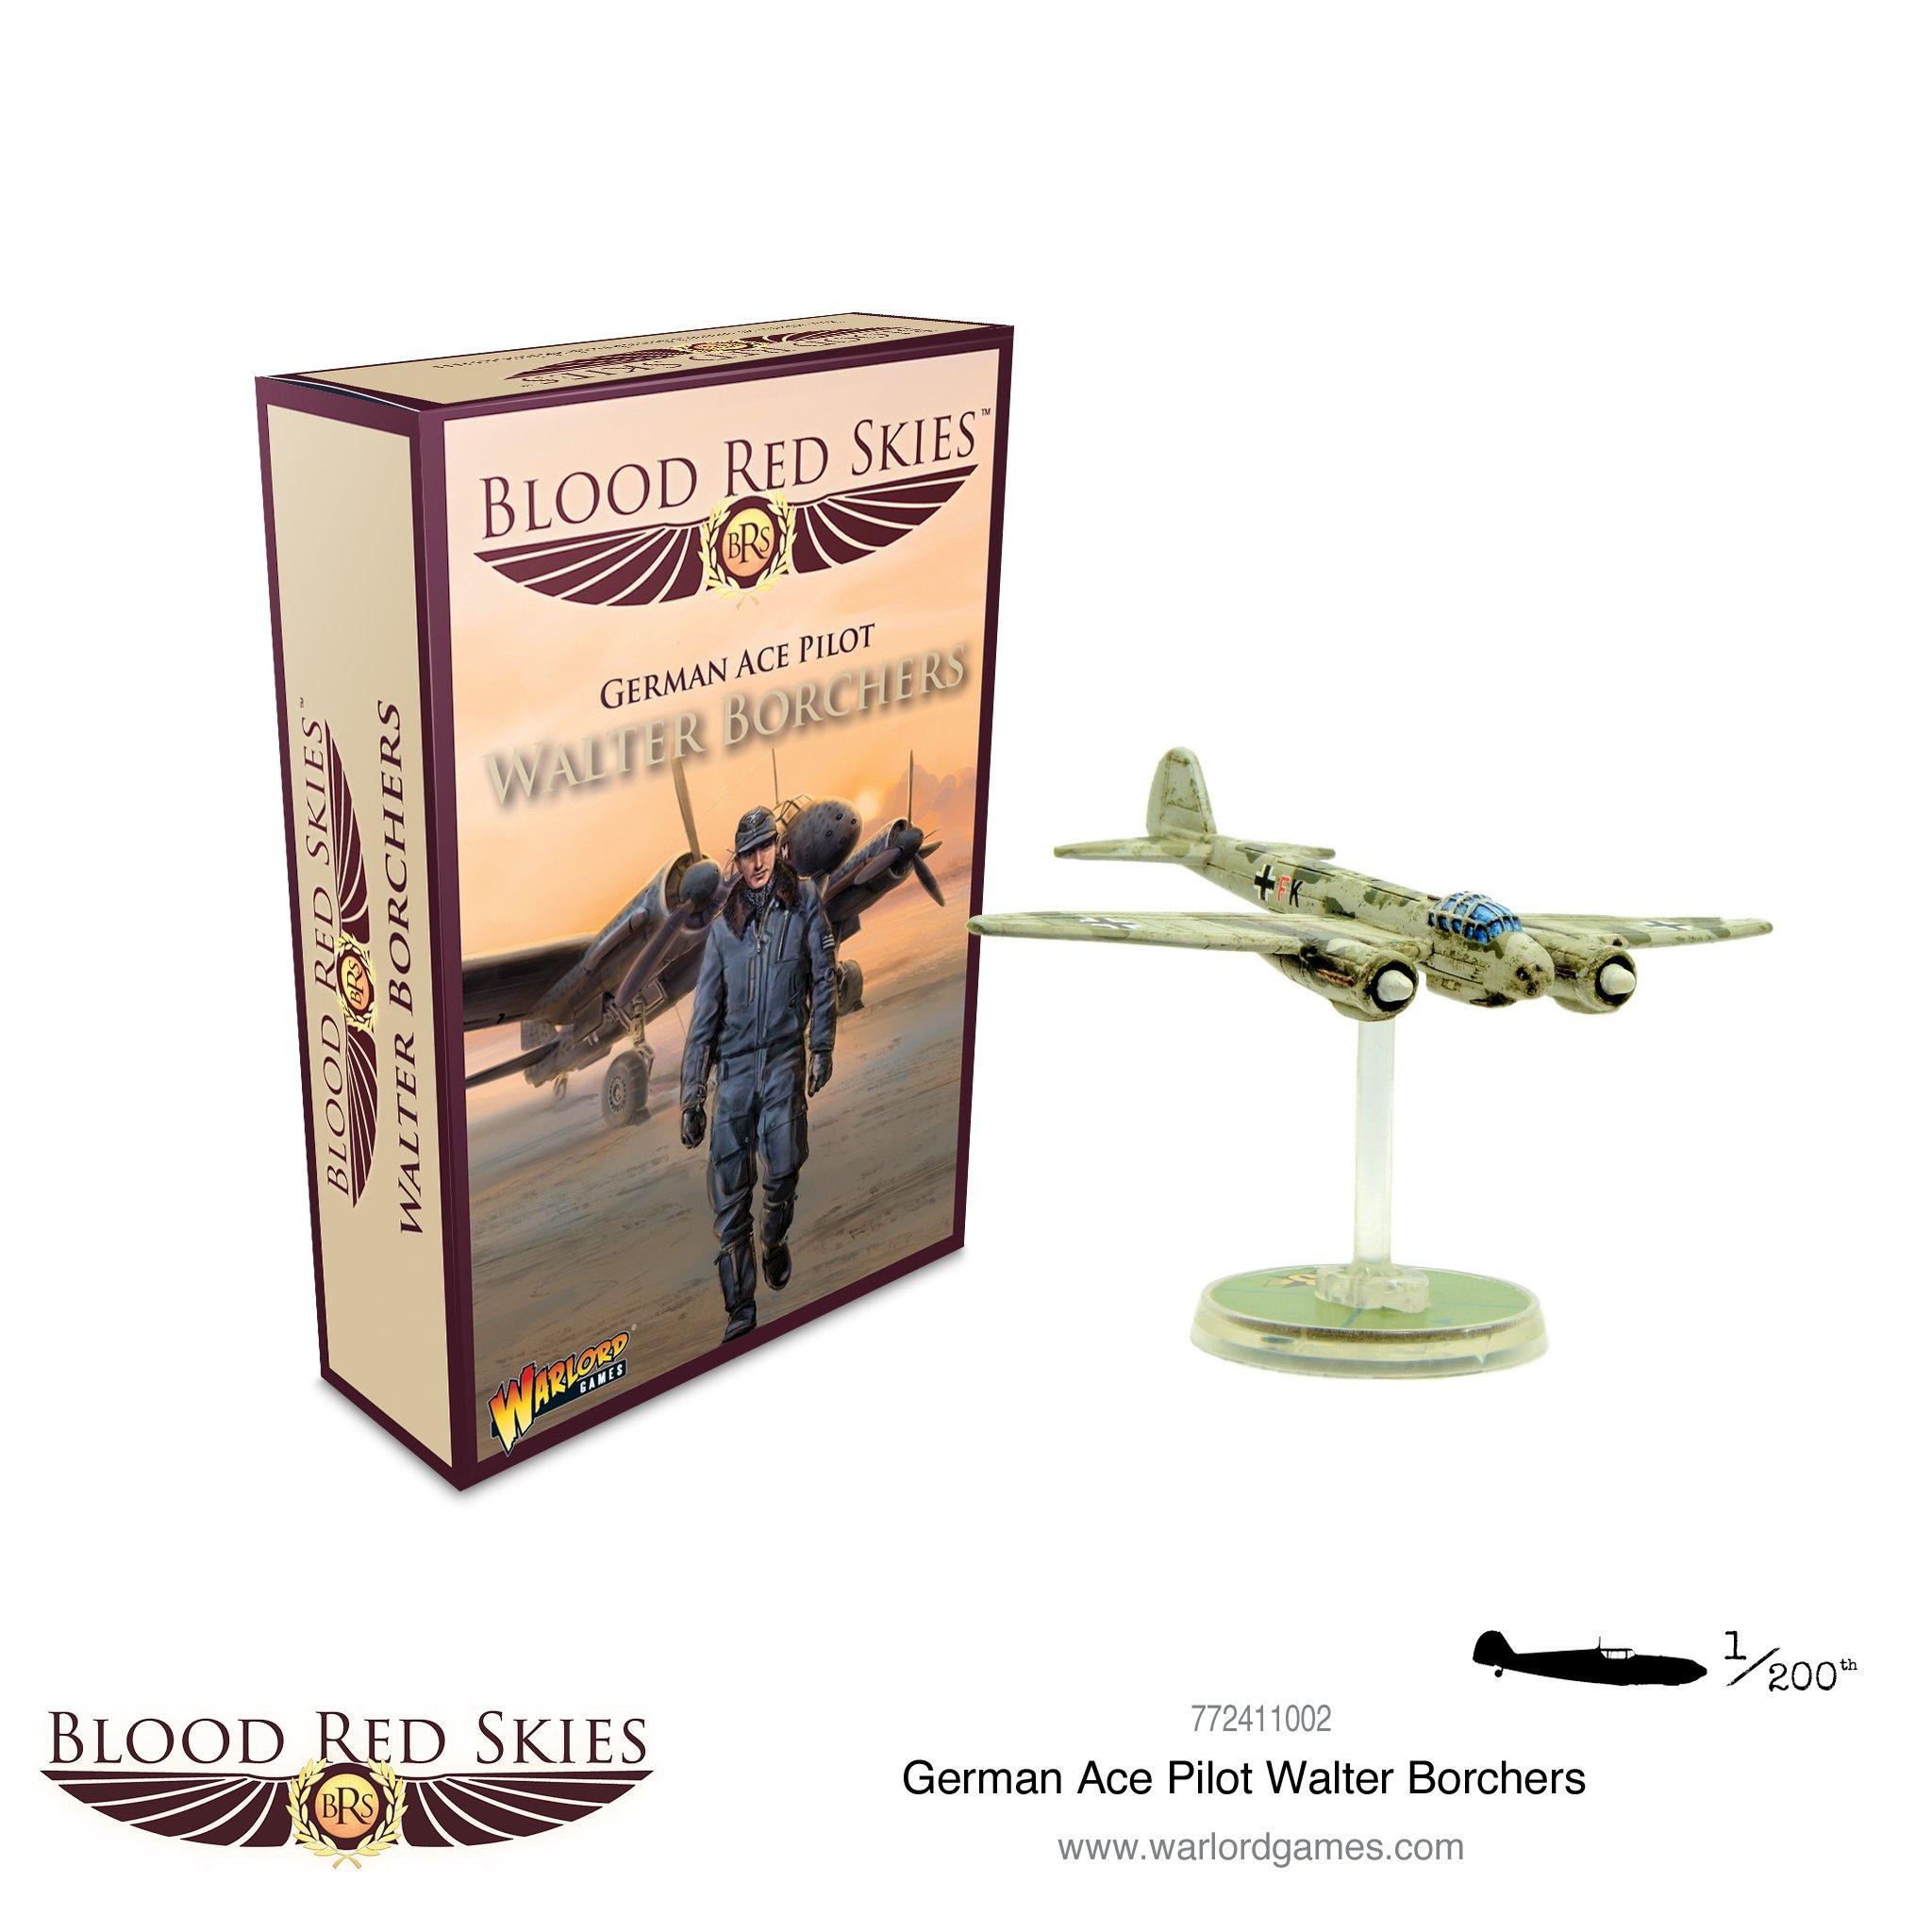 Blood Red Skies German Ace Pilot - Walter Borchers